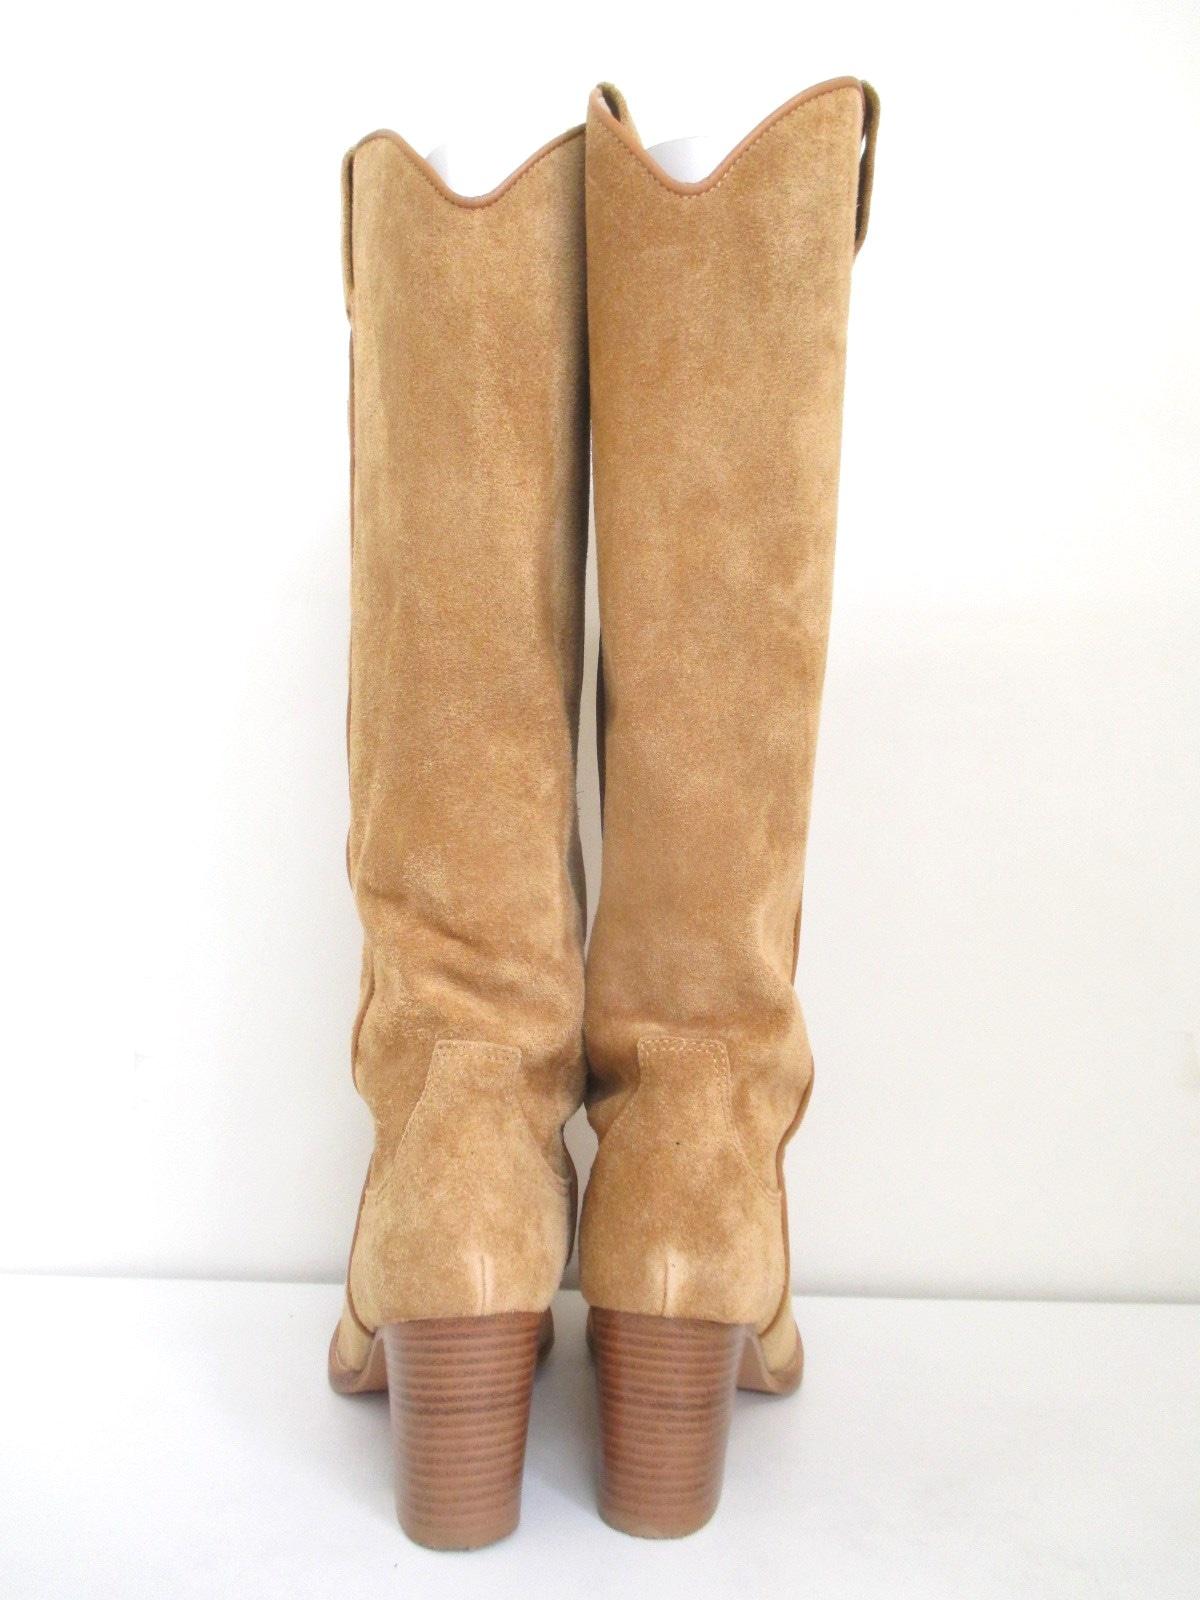 LyricisM(リリシズム)のブーツ